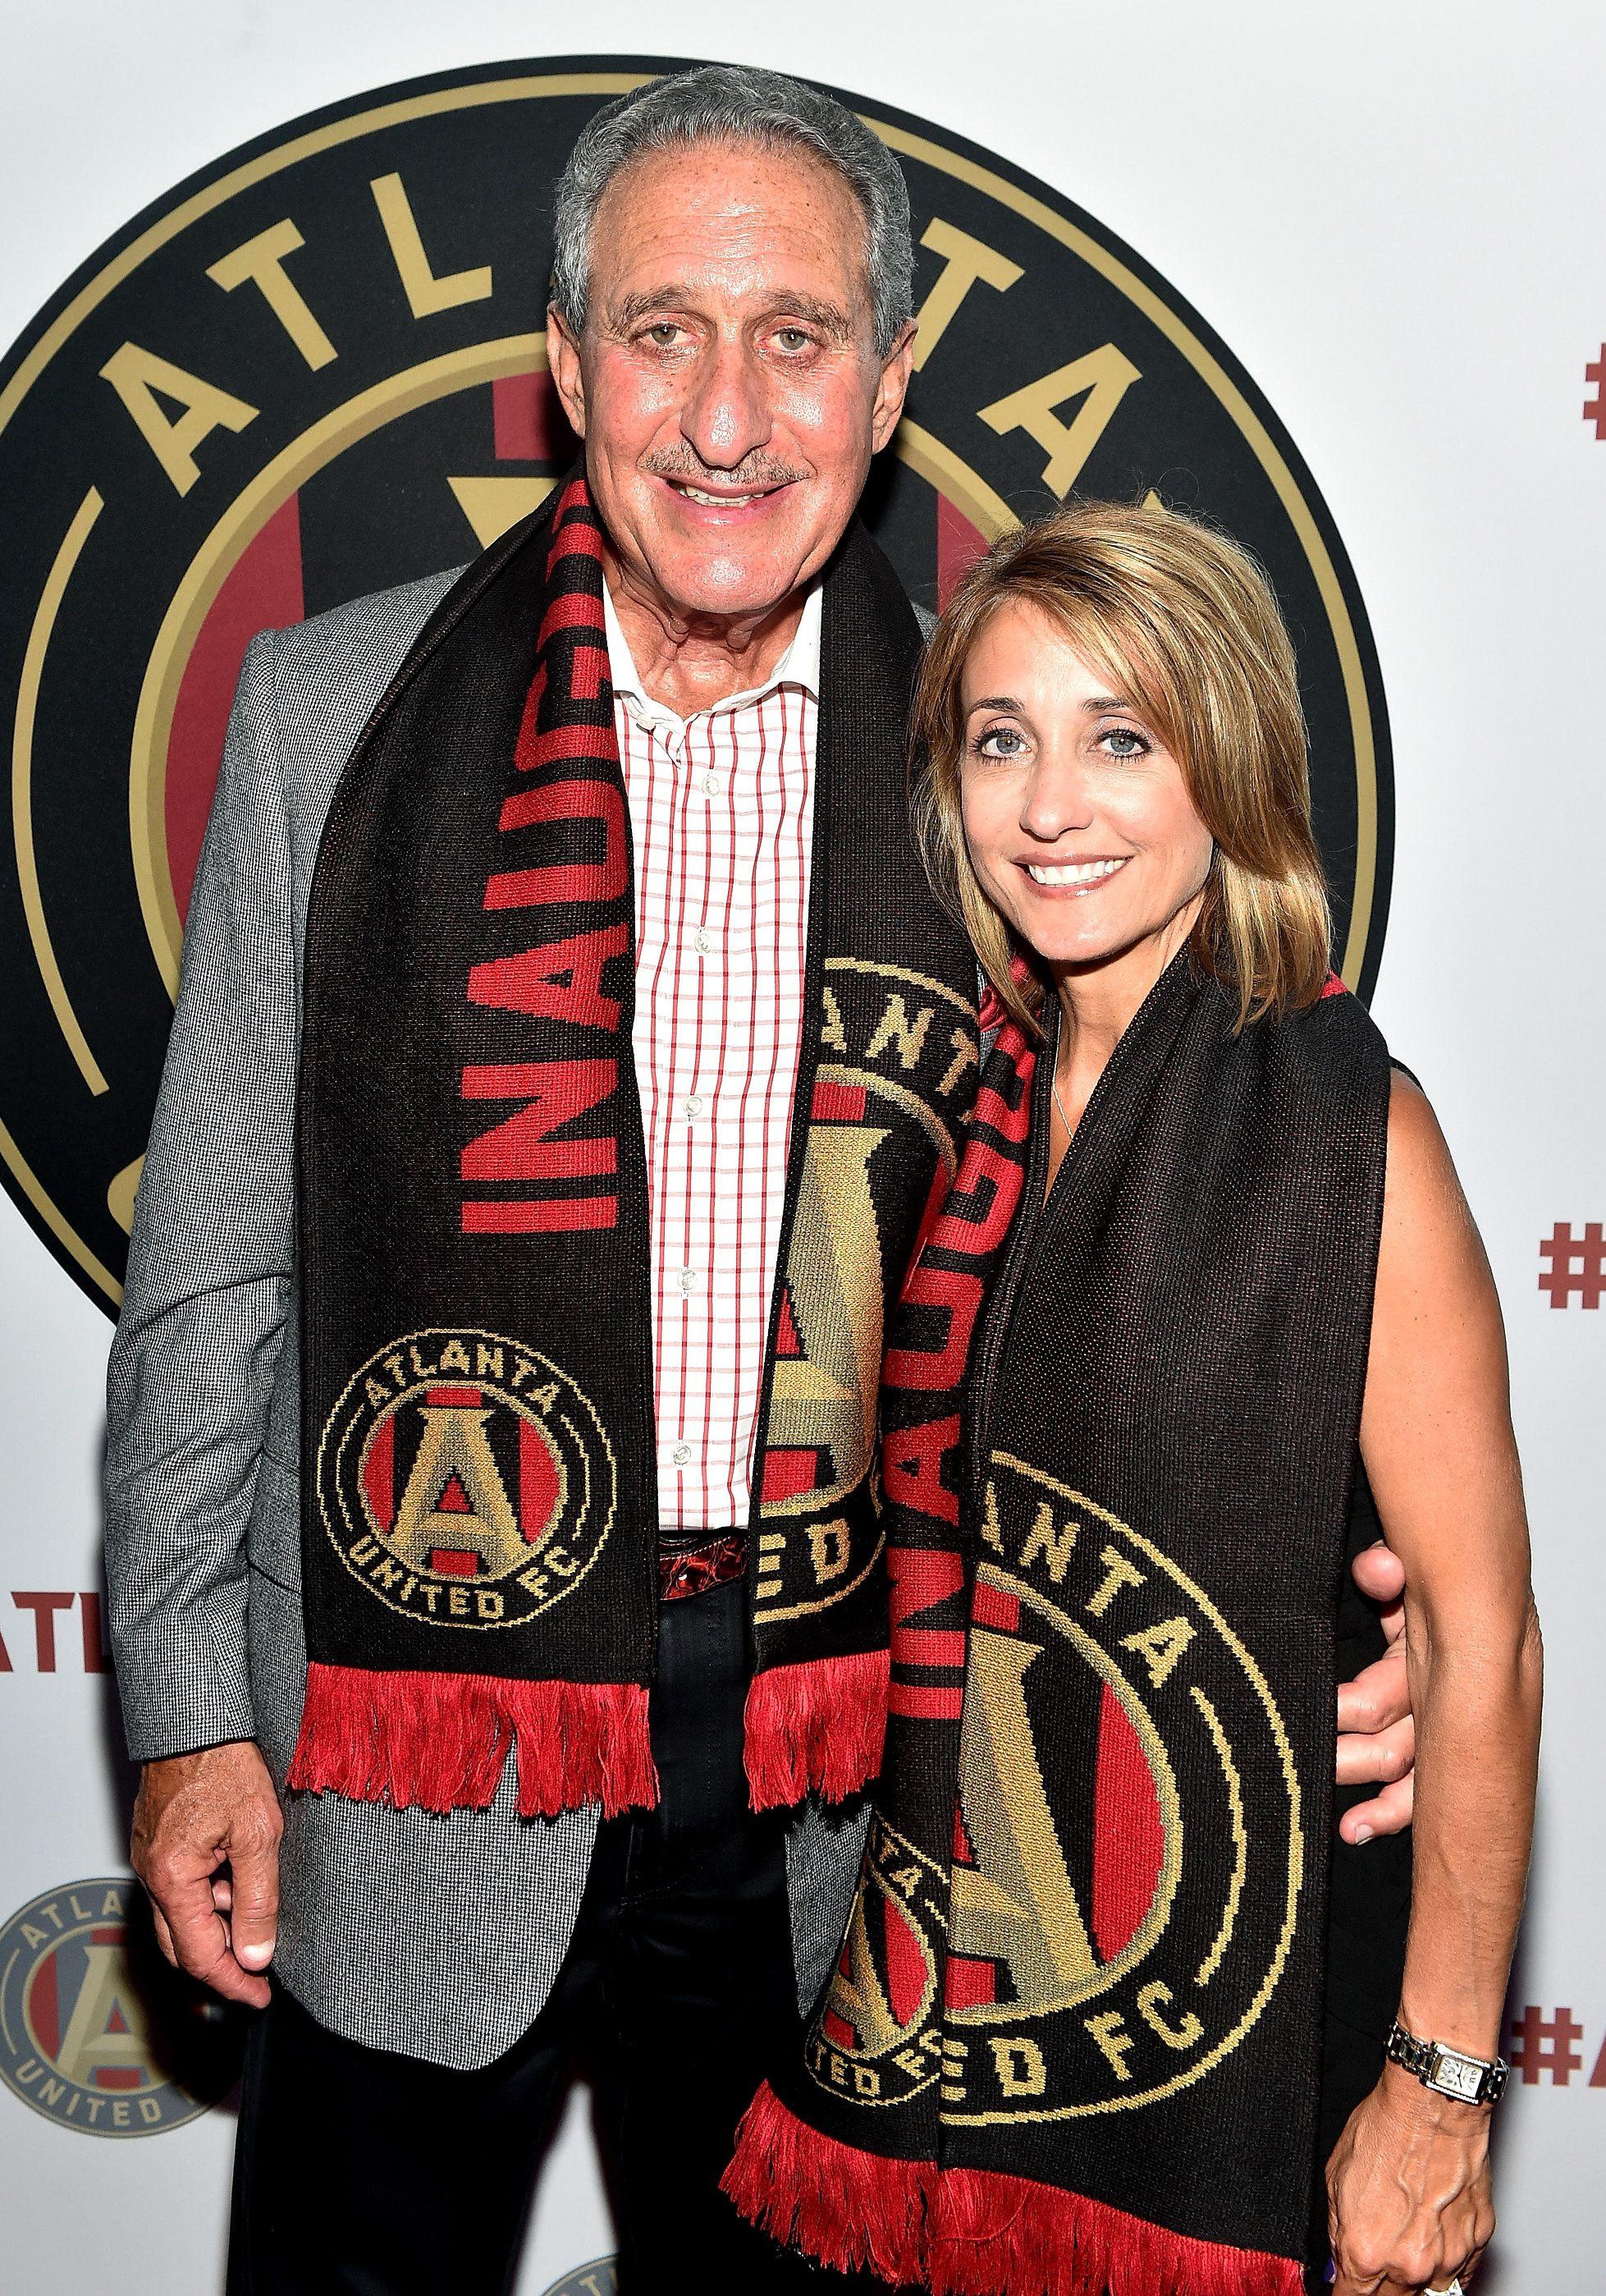 Arthur Blank and Angela Macuga attend the MLS Atlanta Launch Event at SOHO on July 7, 2015 in Atlanta, Georgia. (Getty)